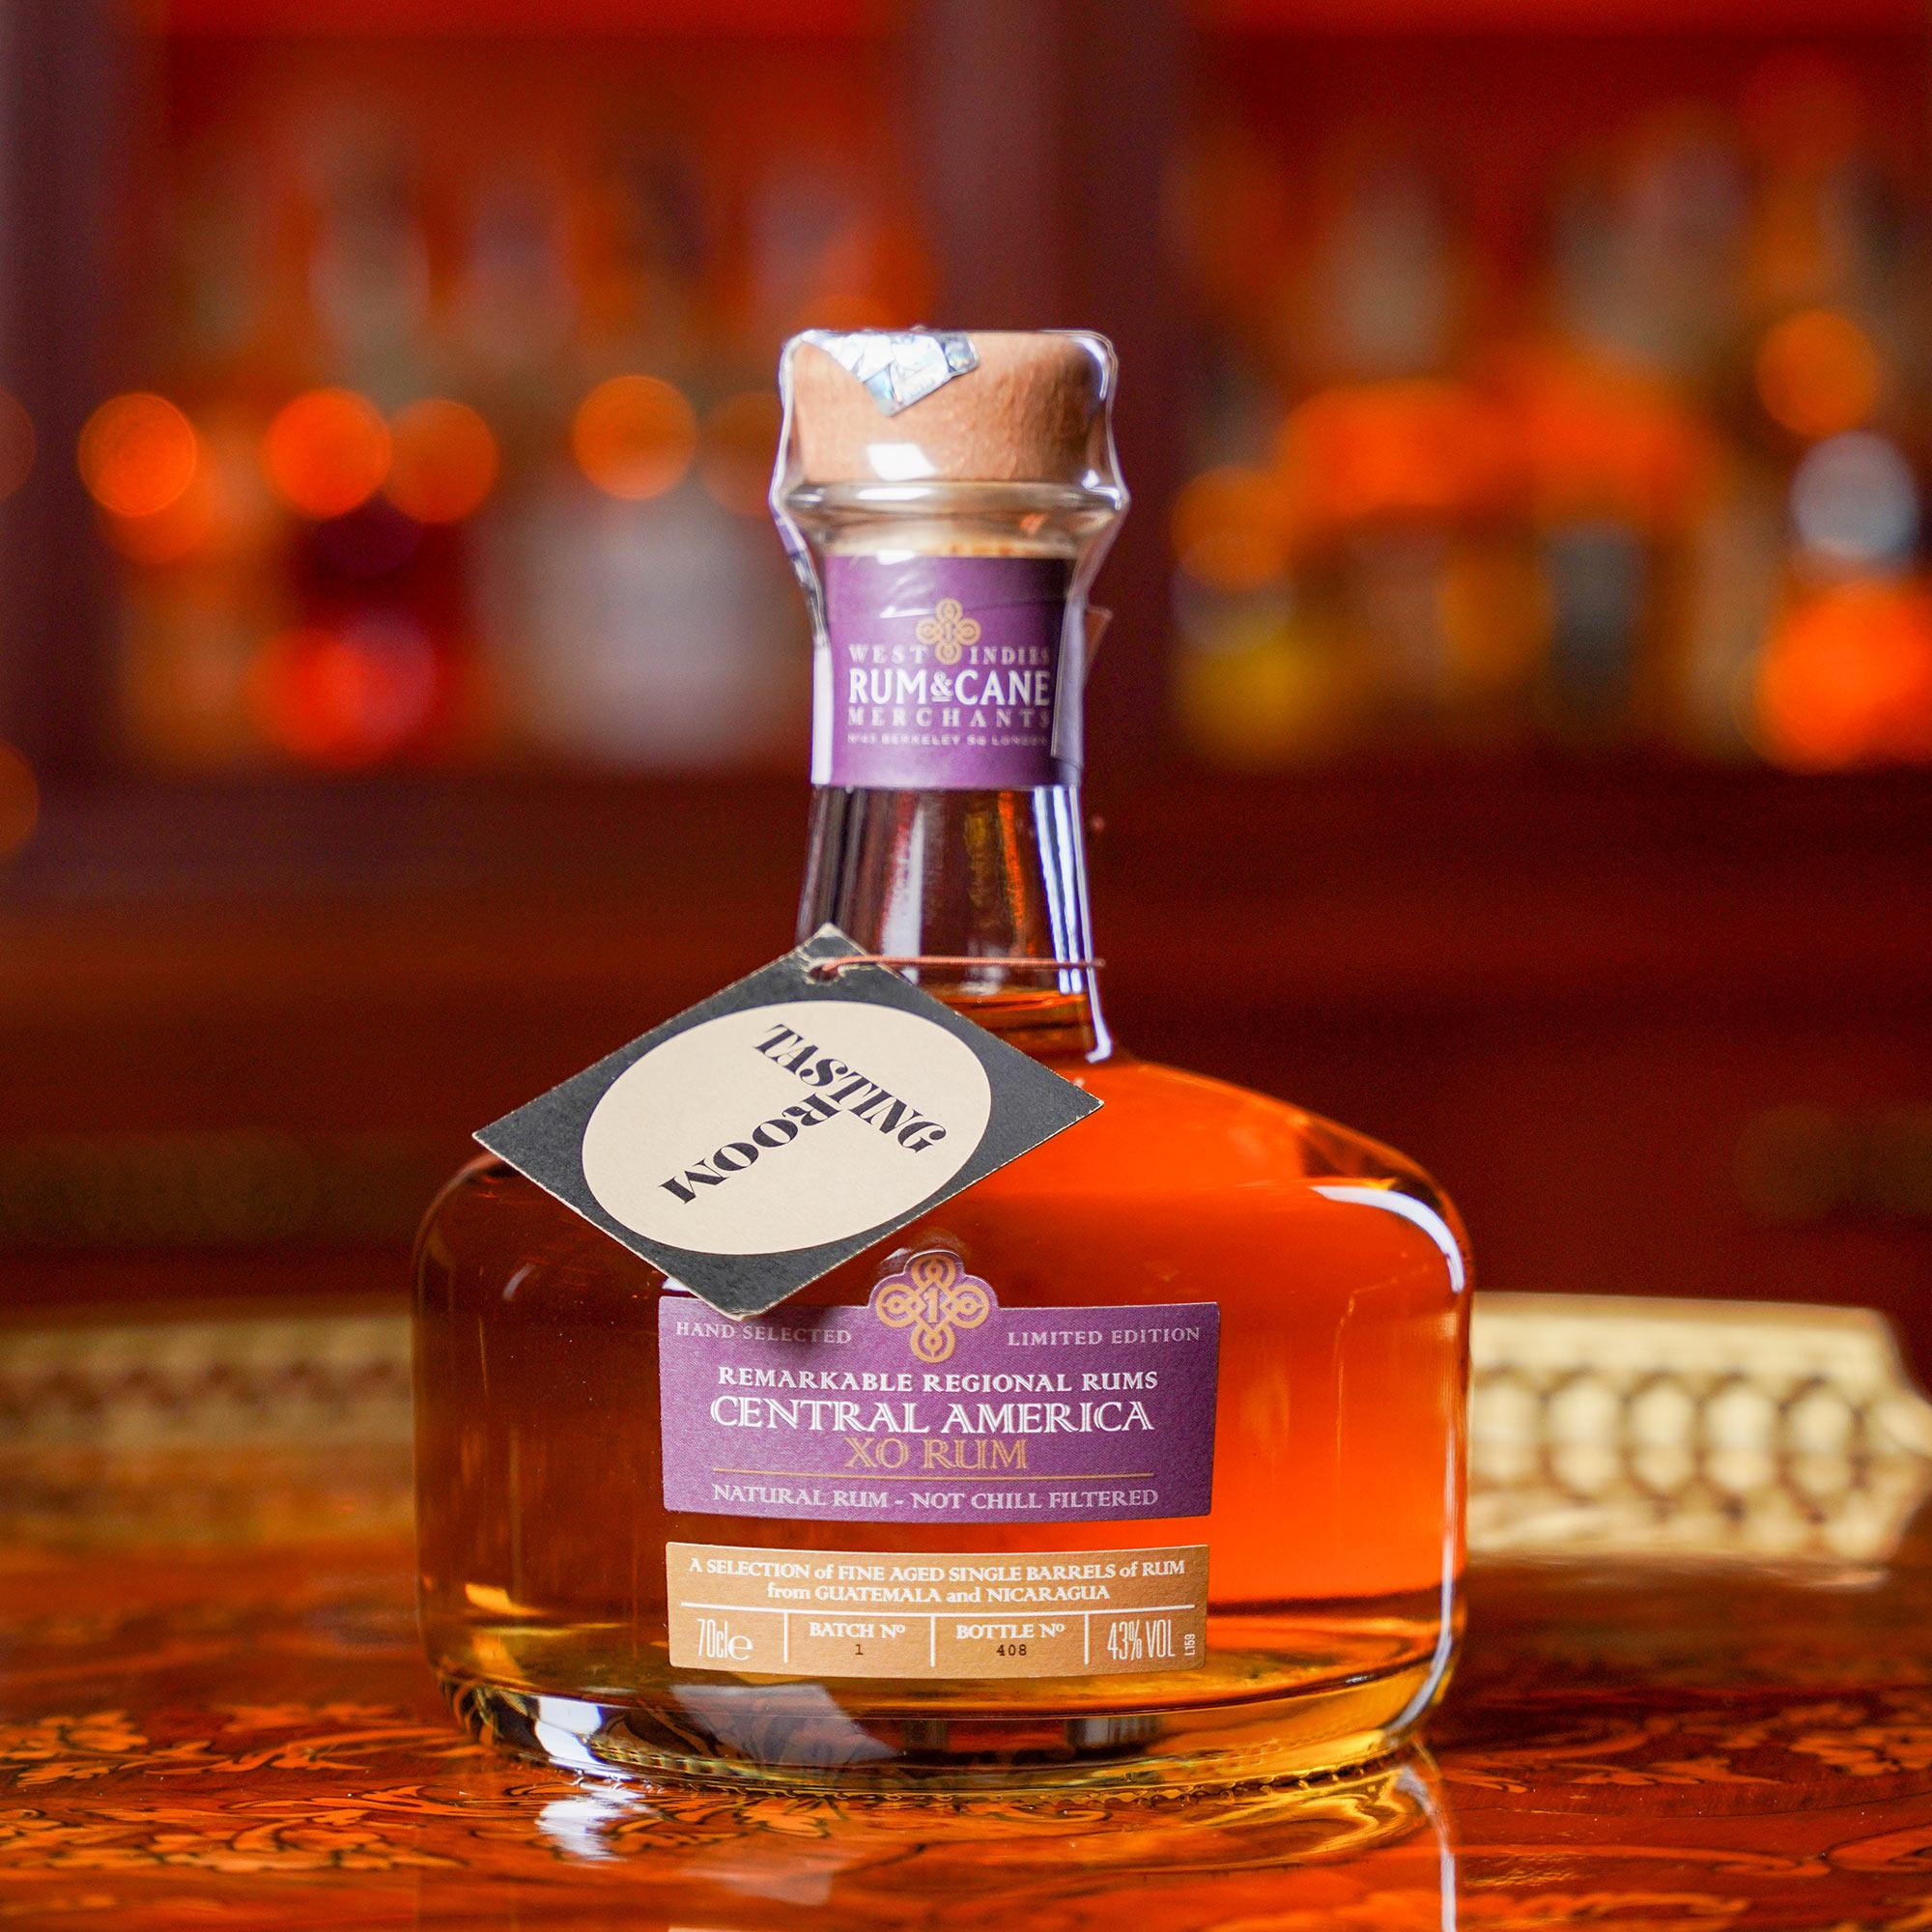 Central America XO Rum /Централ Америка XO Ром